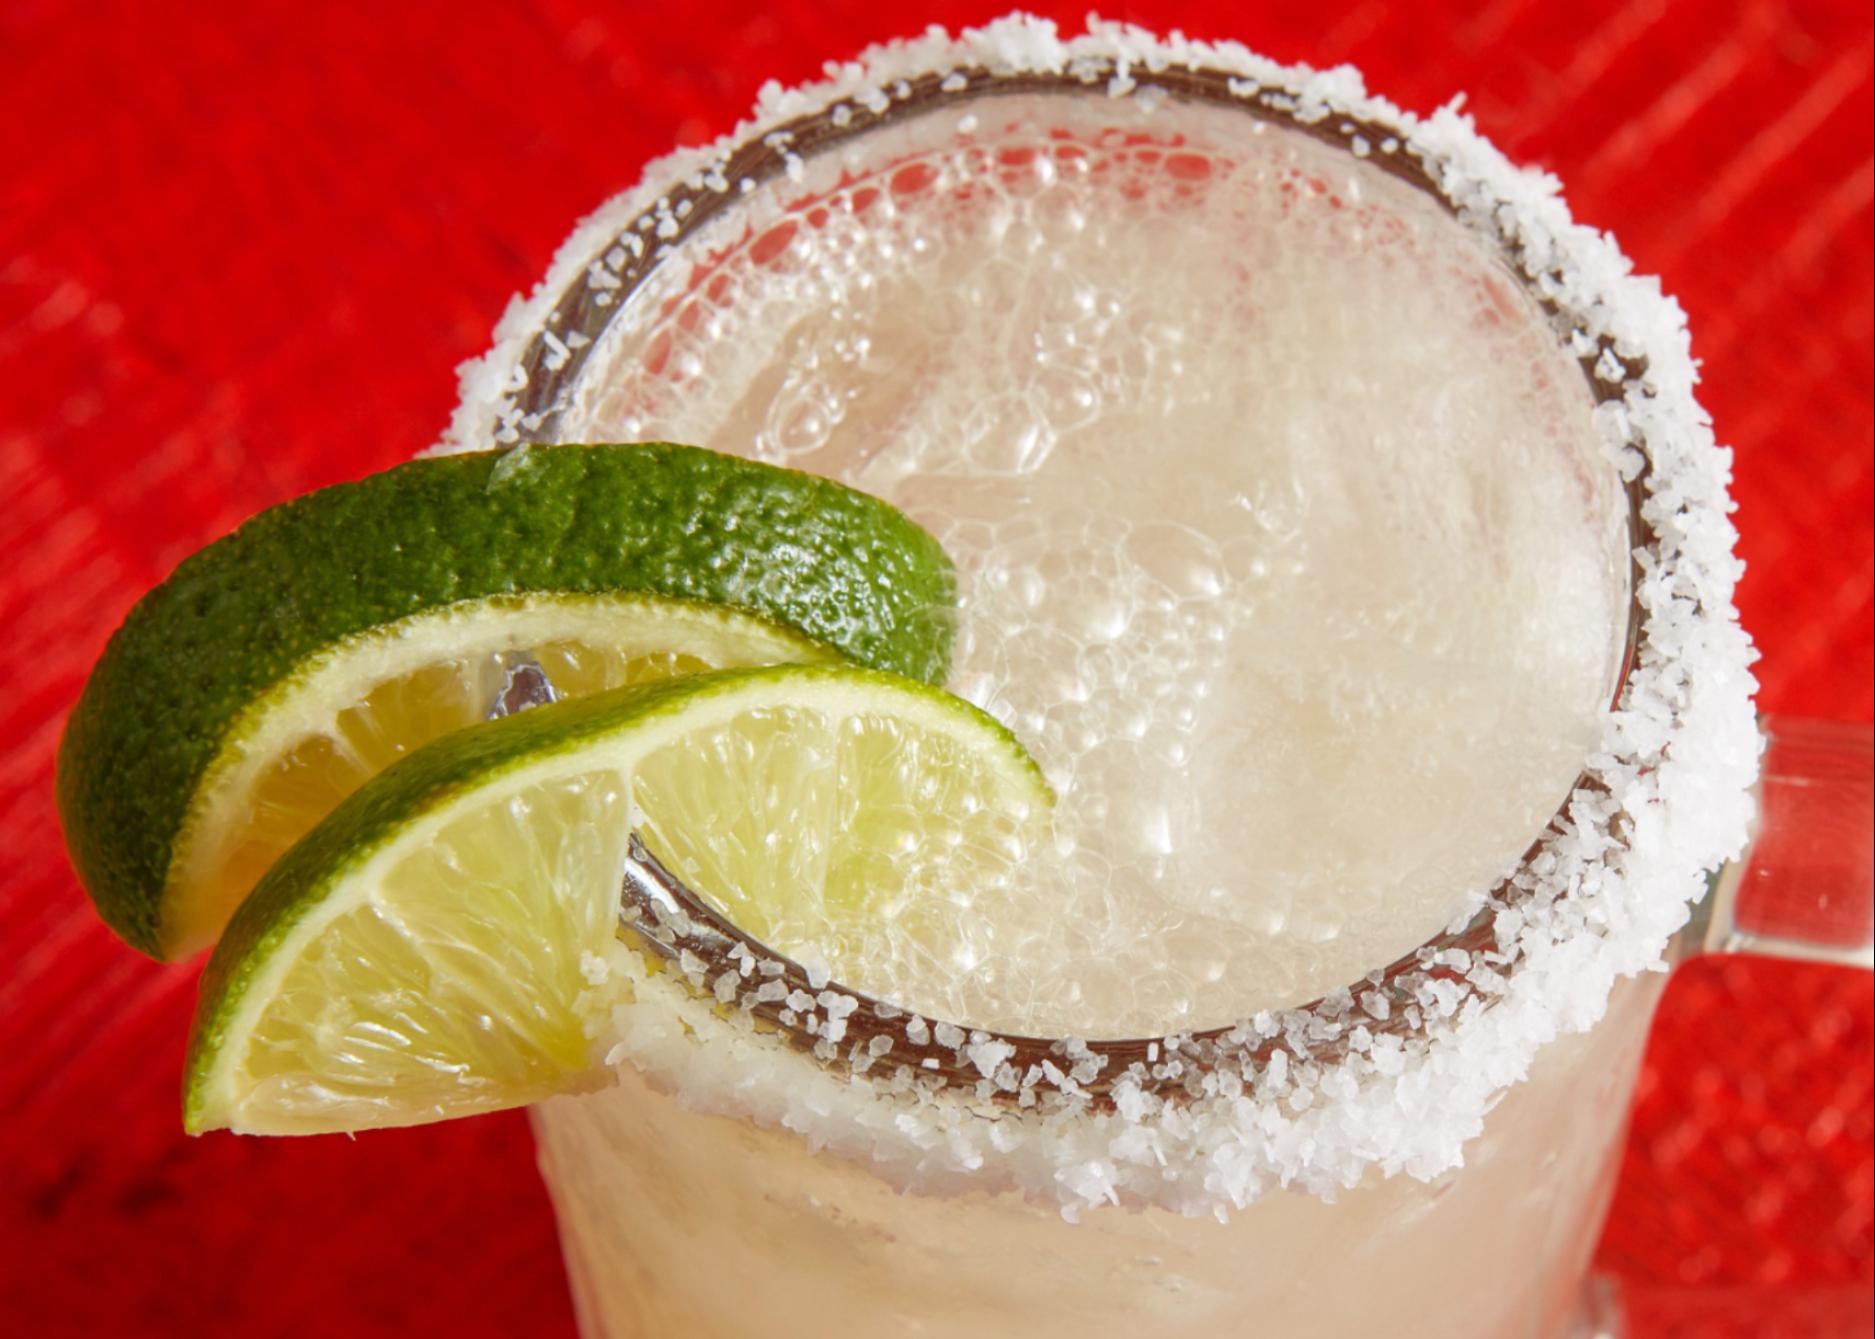 #2 - Tex Tubb's Taco PalaceOffering: Palace Margaritas